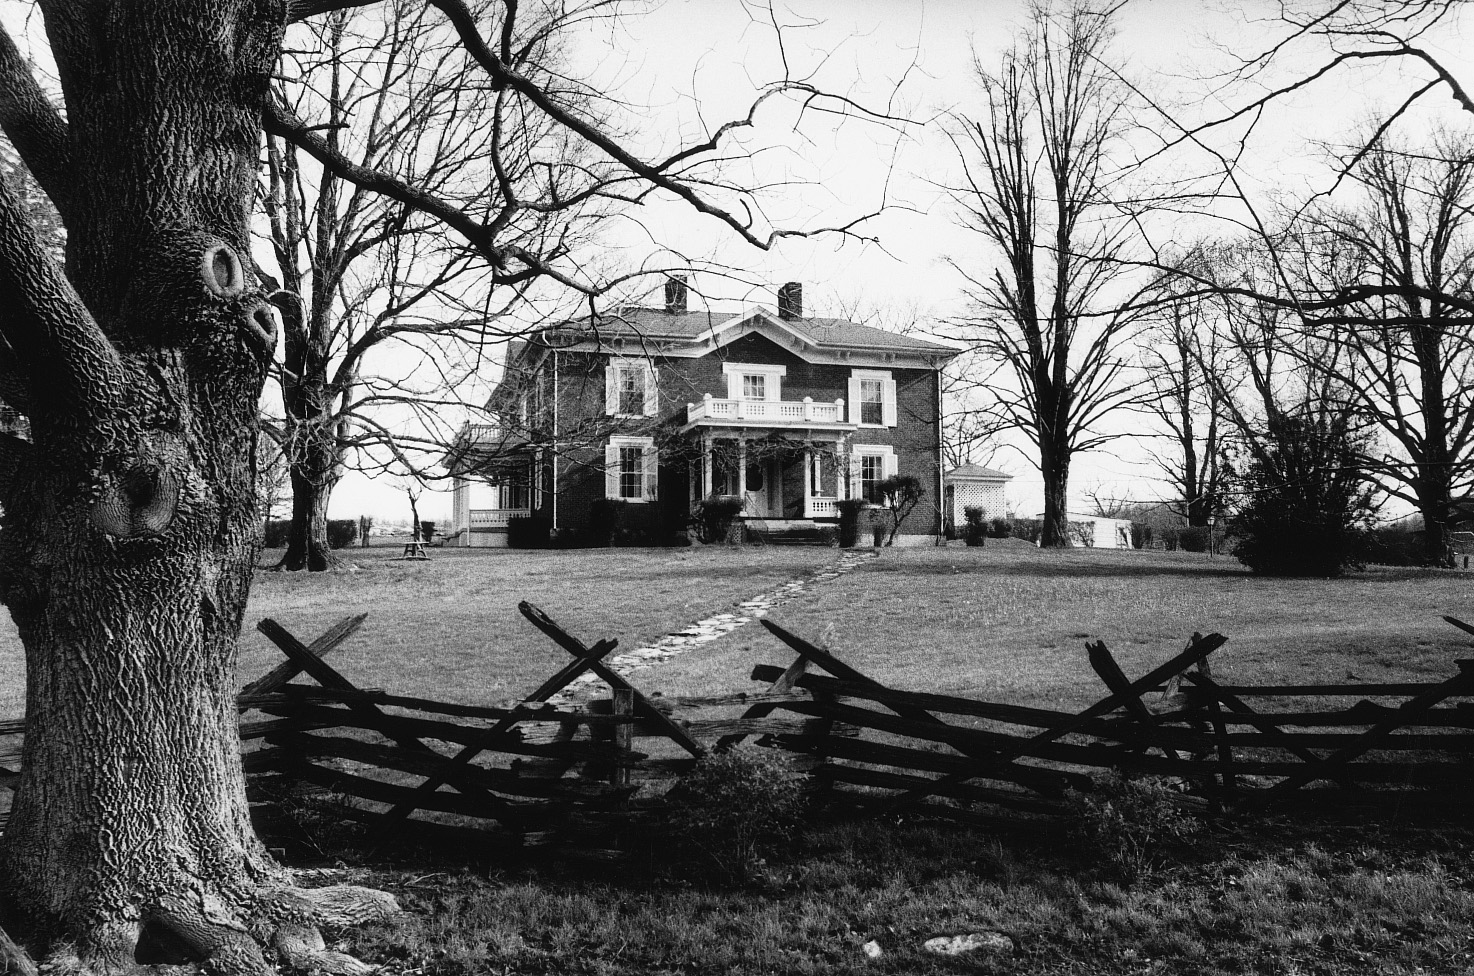 Alexander St. Clair House